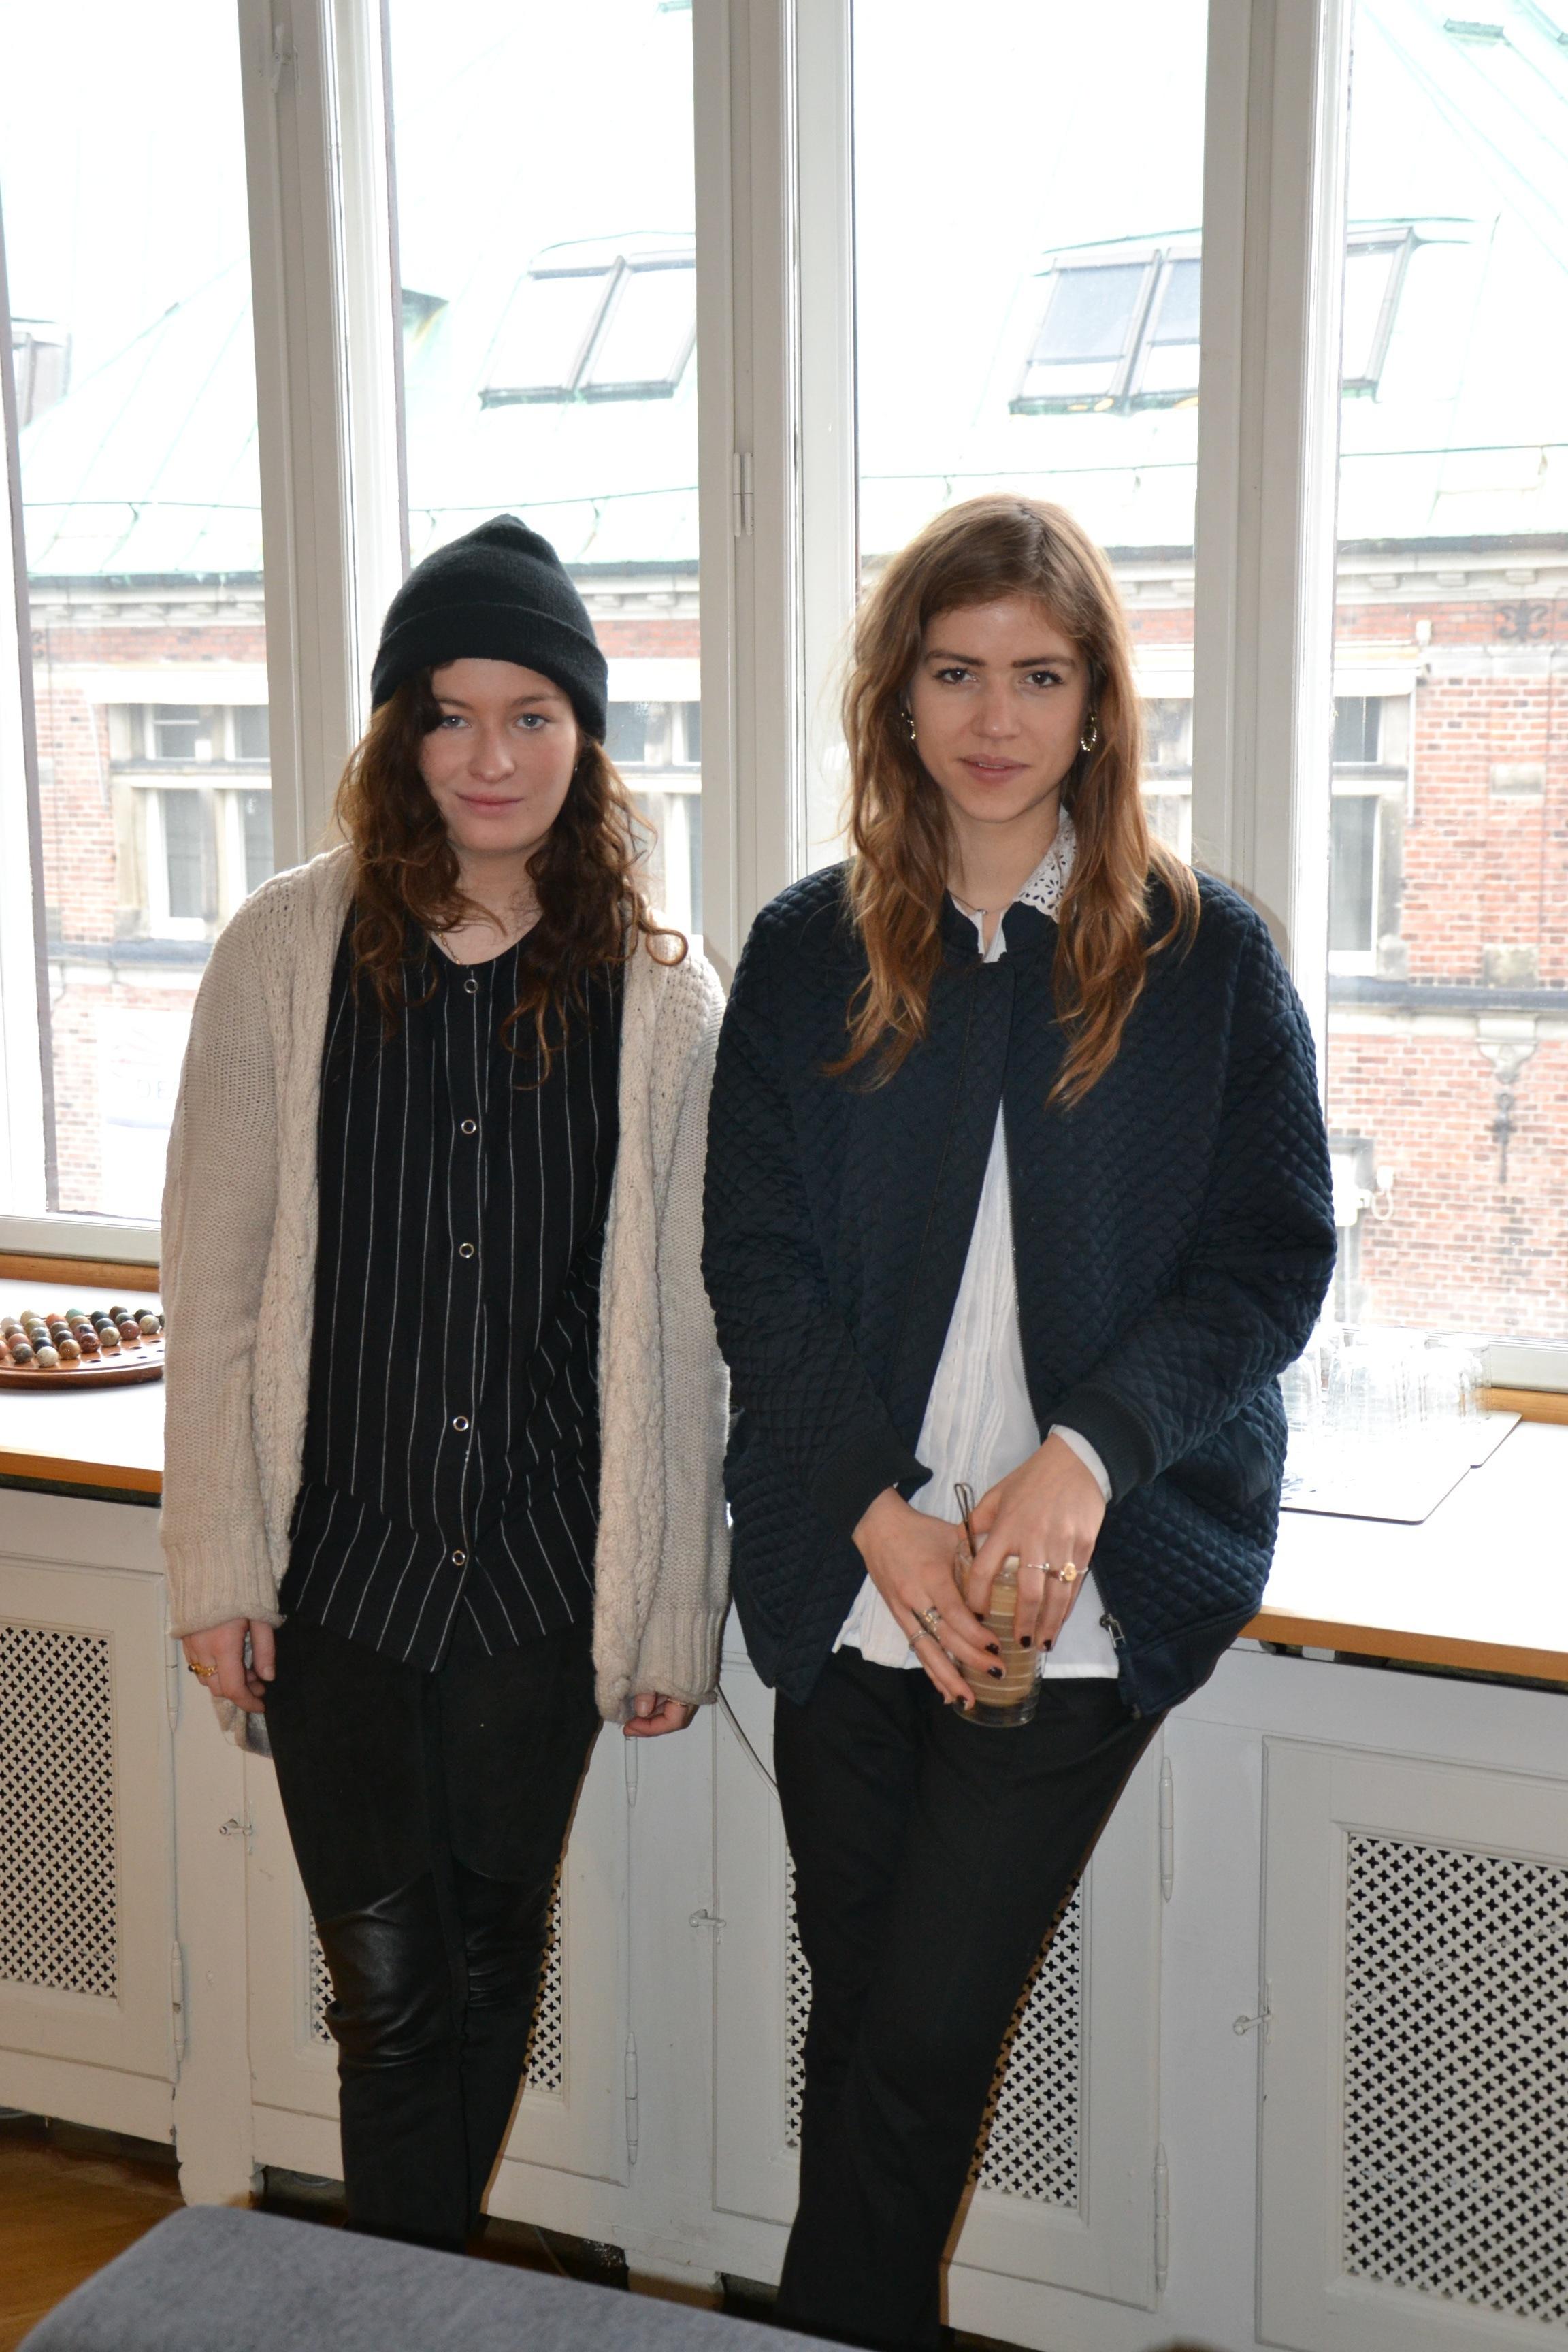 Annika og Trine